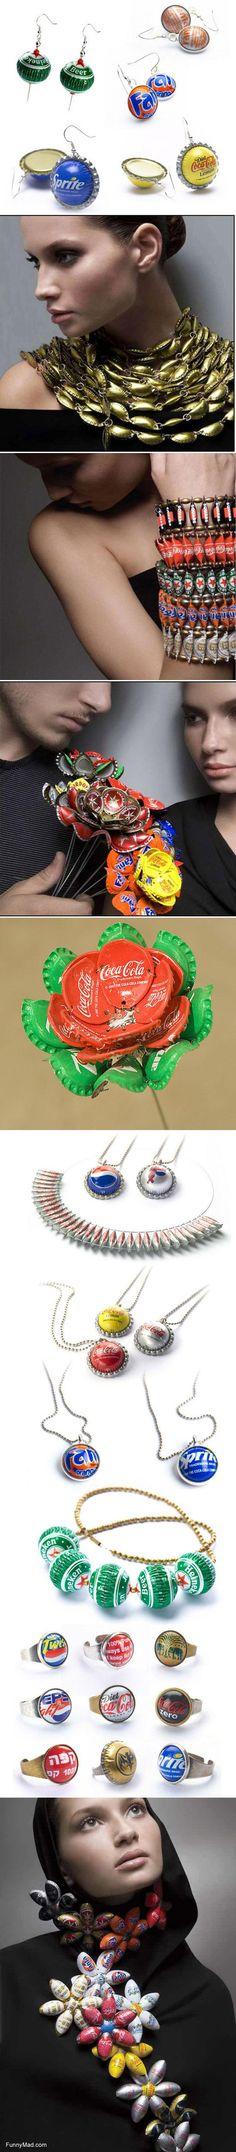 Bottle Cap Jewelry #diy #craft